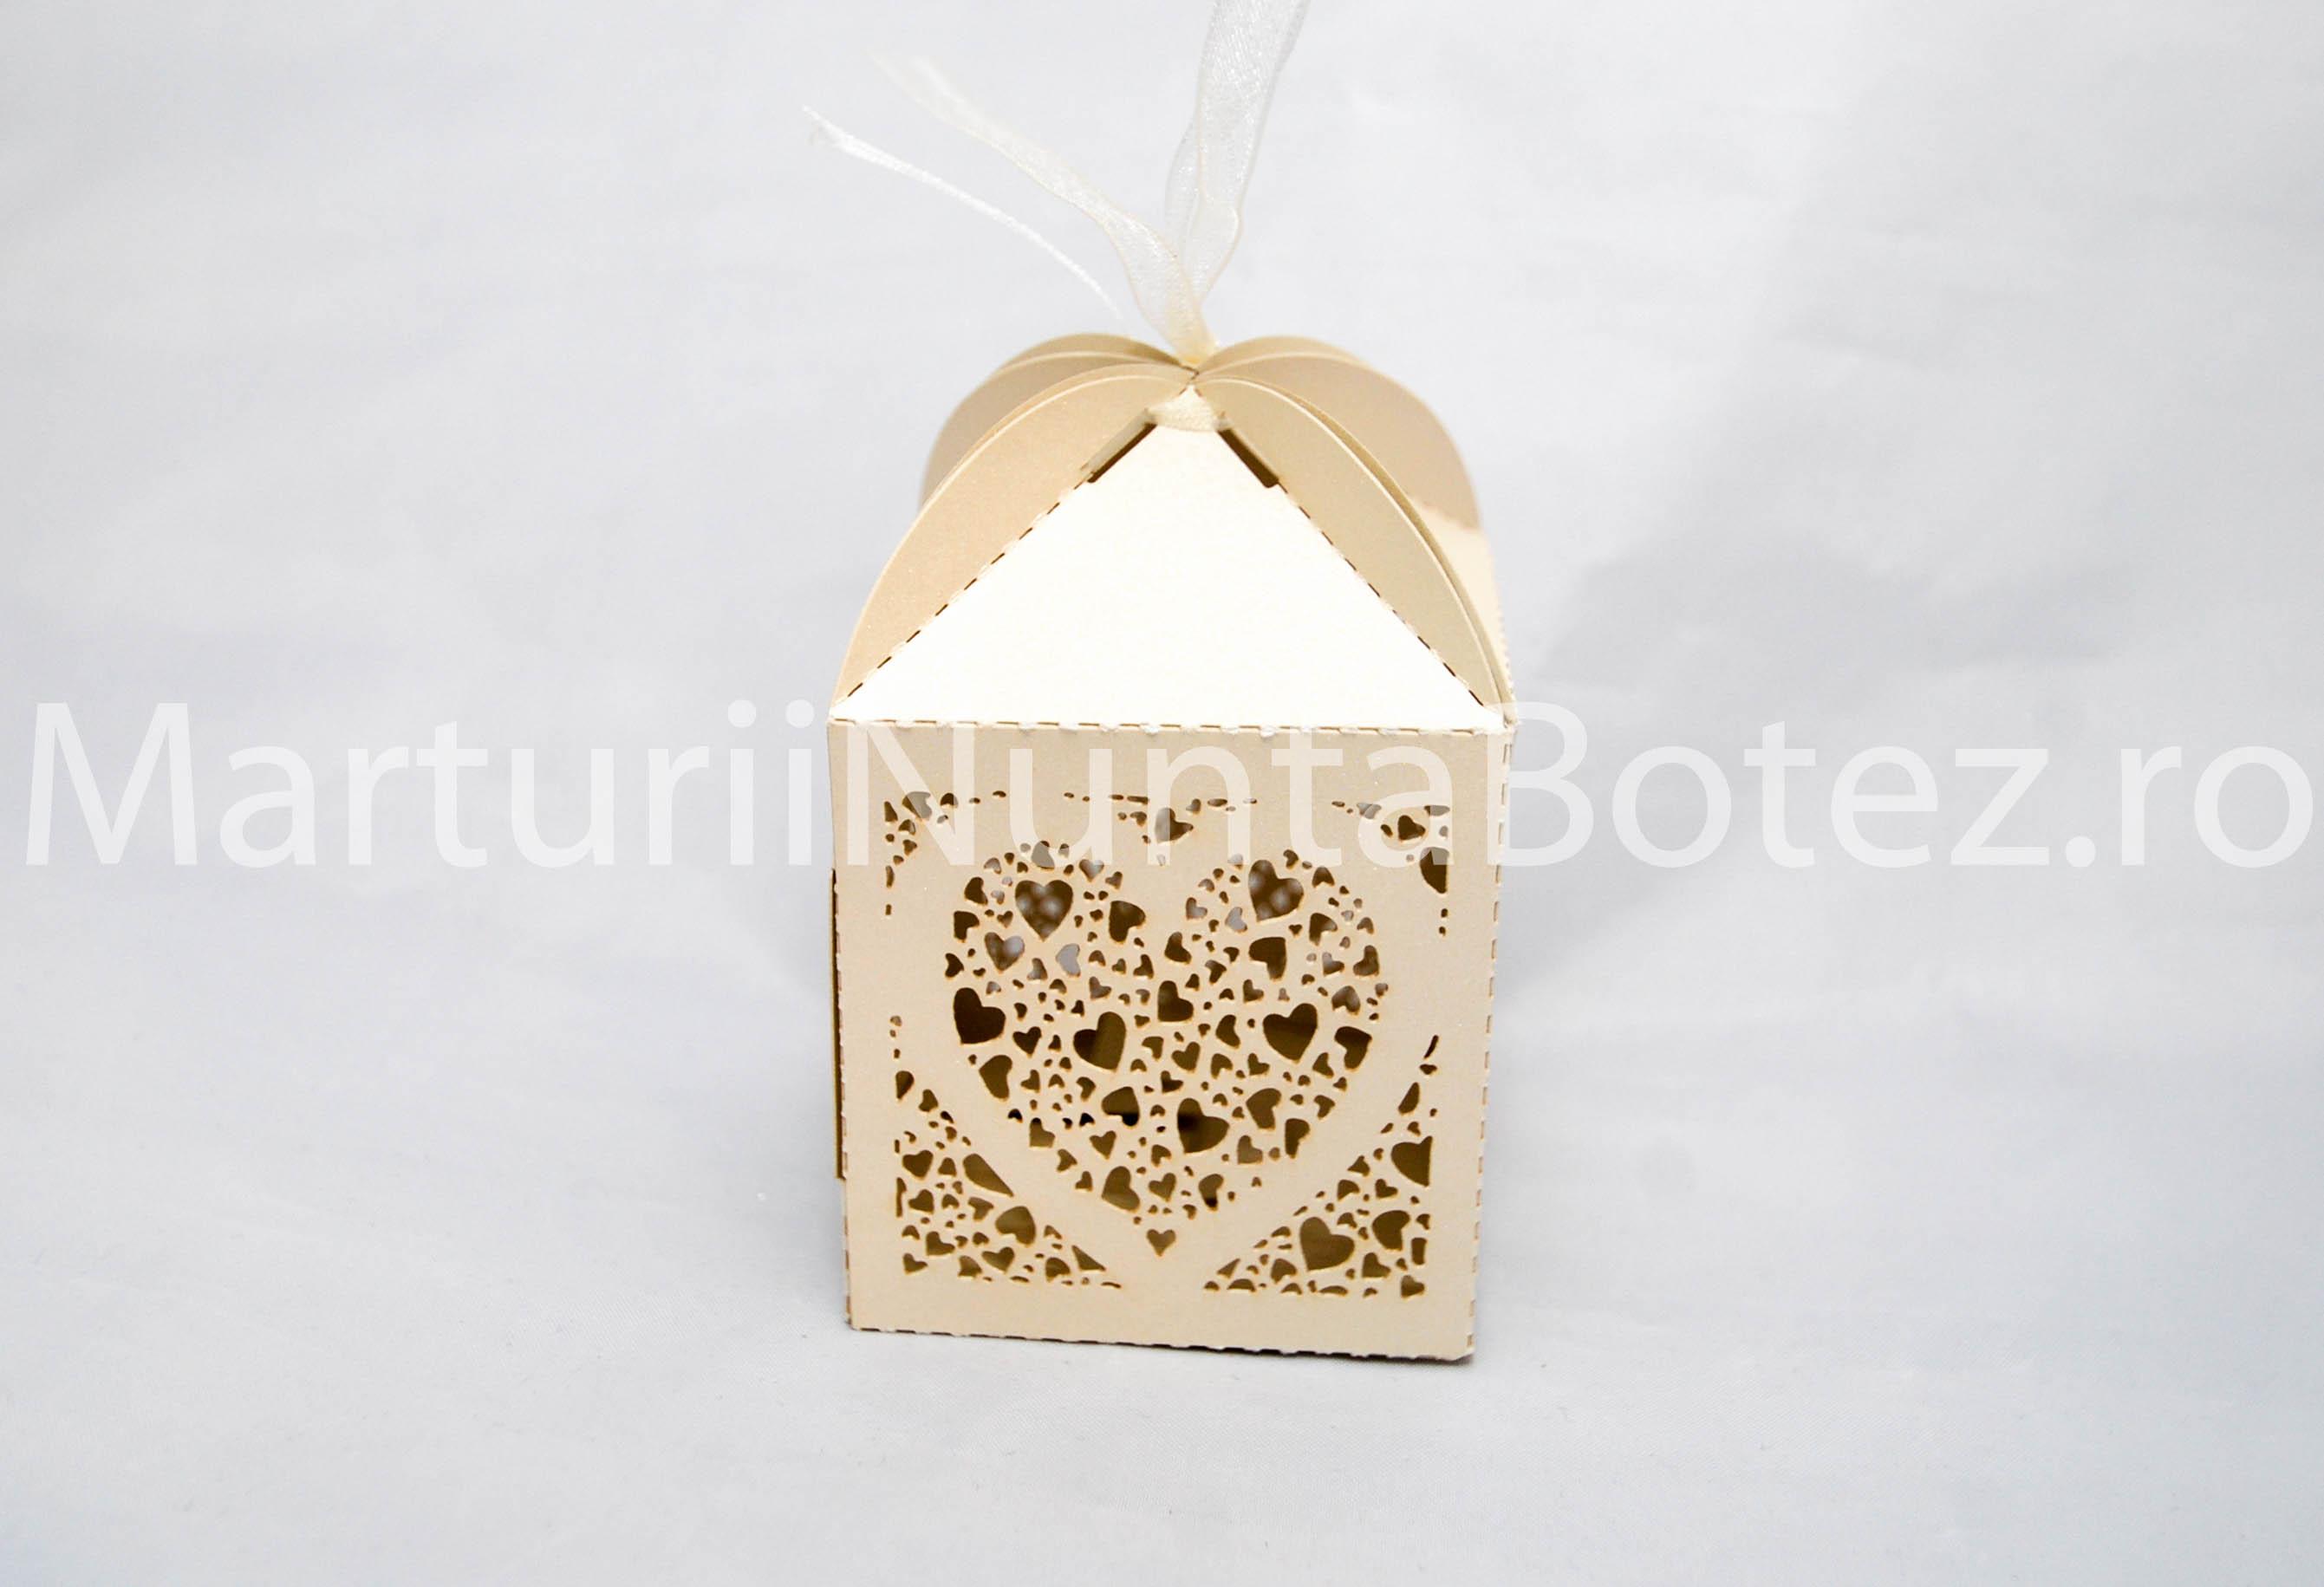 marturii_nunta_cutie_perforata_carton_model_inima_deosebita4